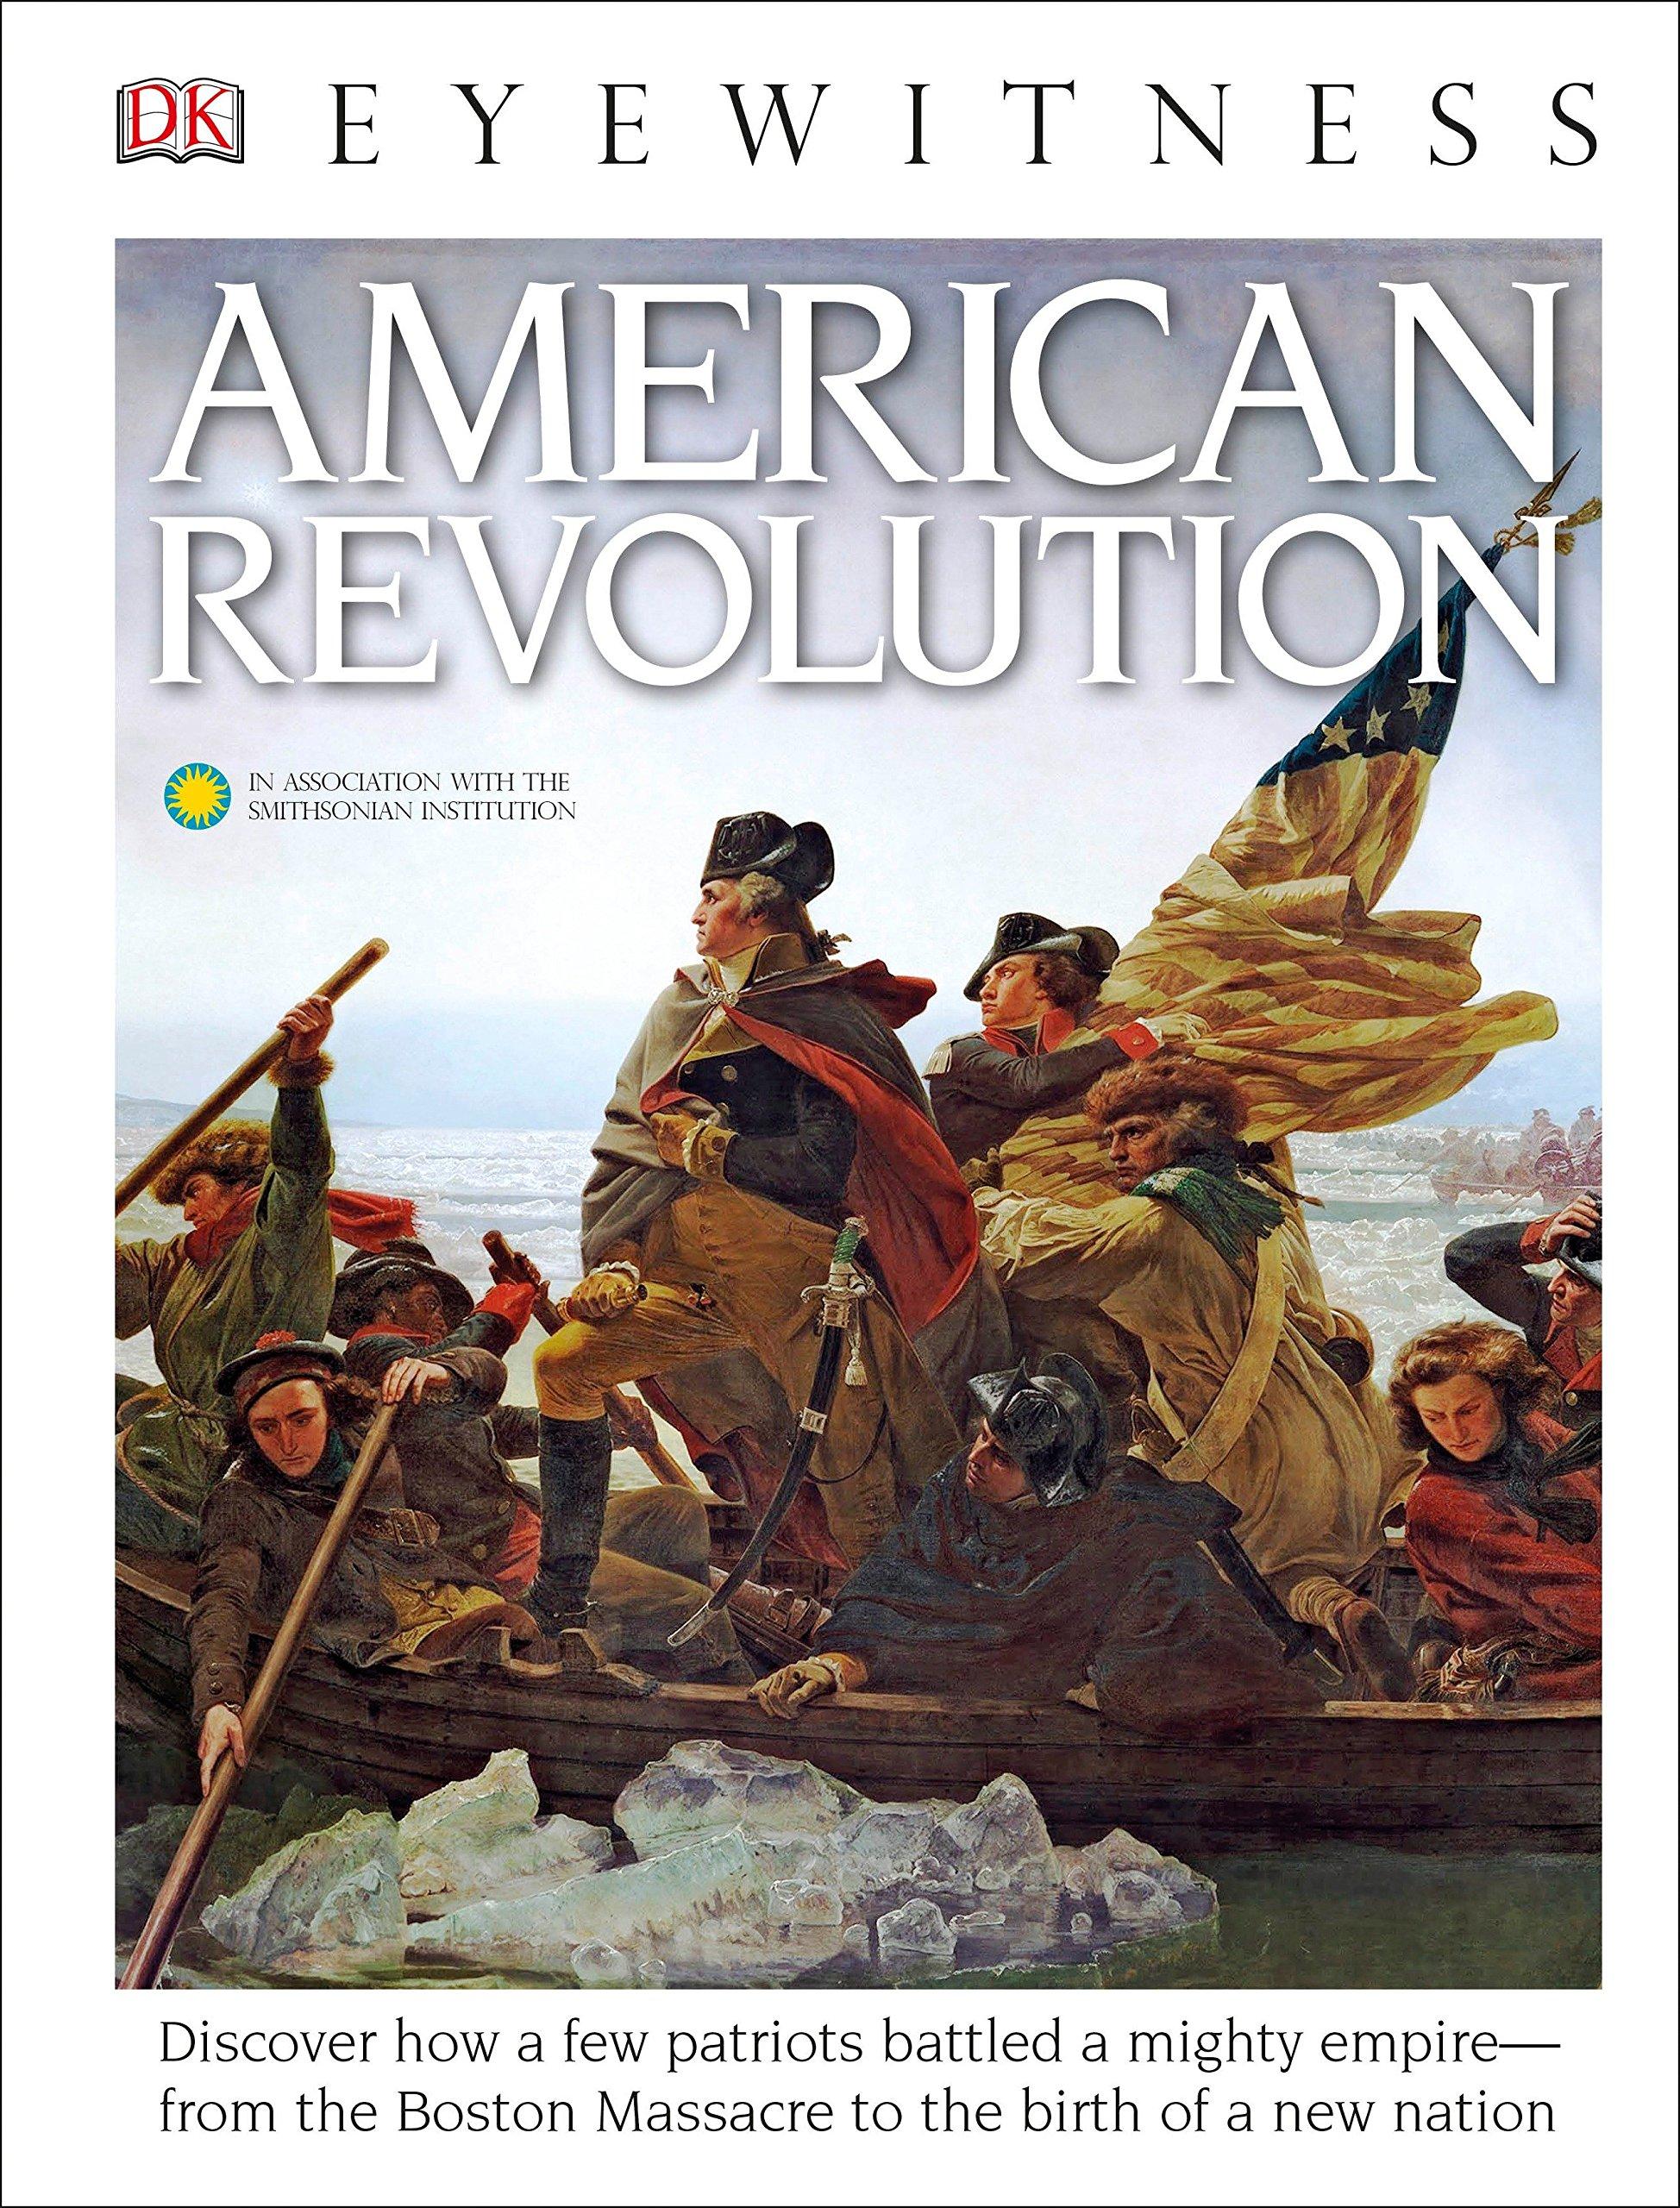 DK Eyewitness Books: American Revolution (Library Edition)